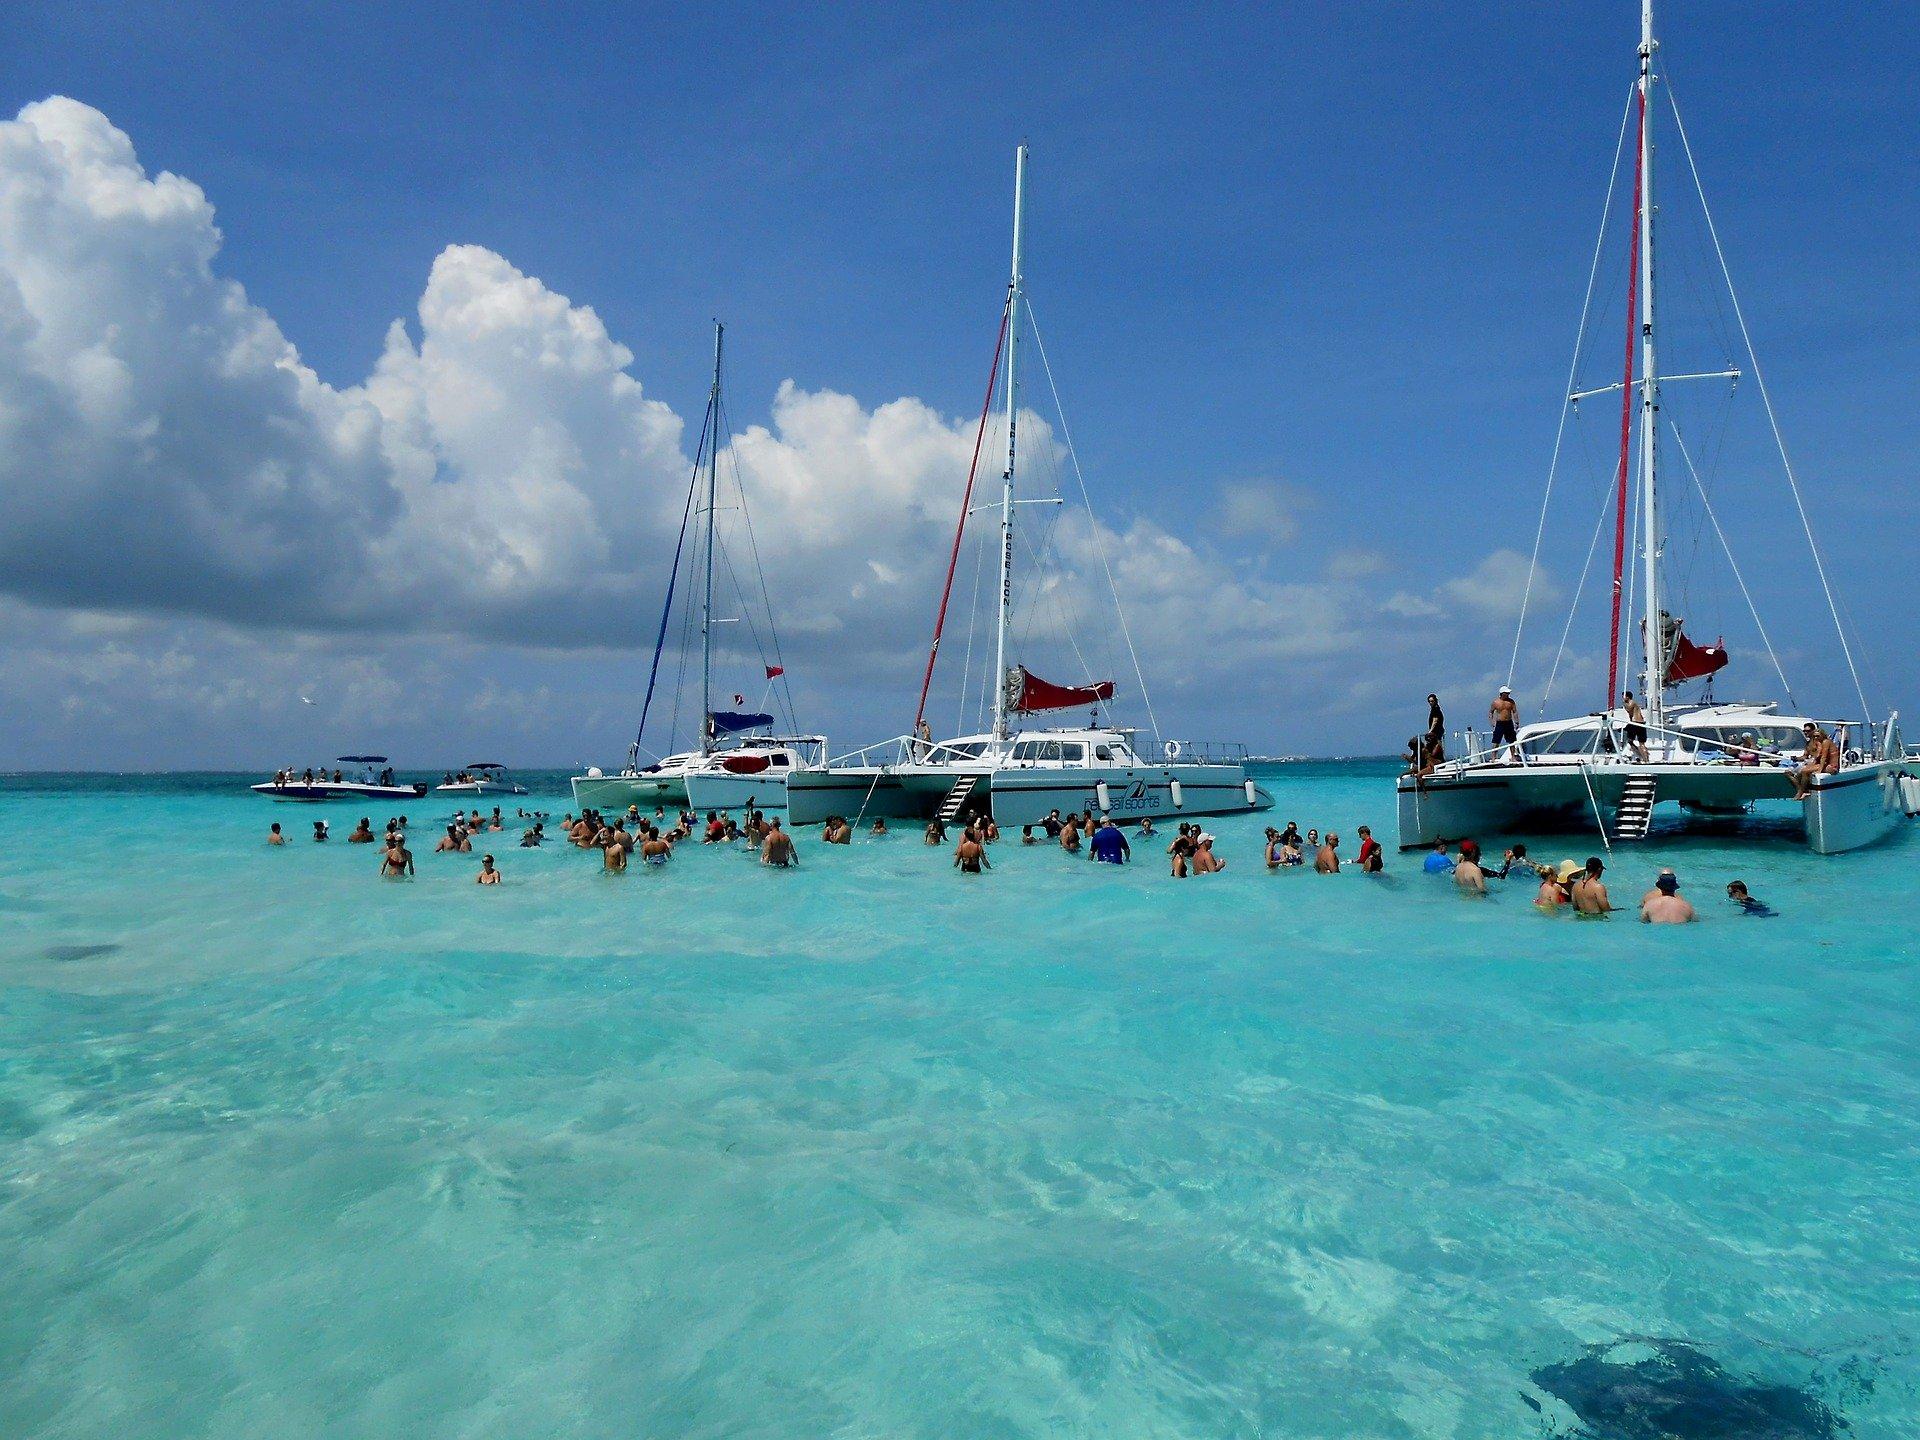 christmas destinations cayman islands - 28 superb Christmas destinations for your holidays 2019/2020